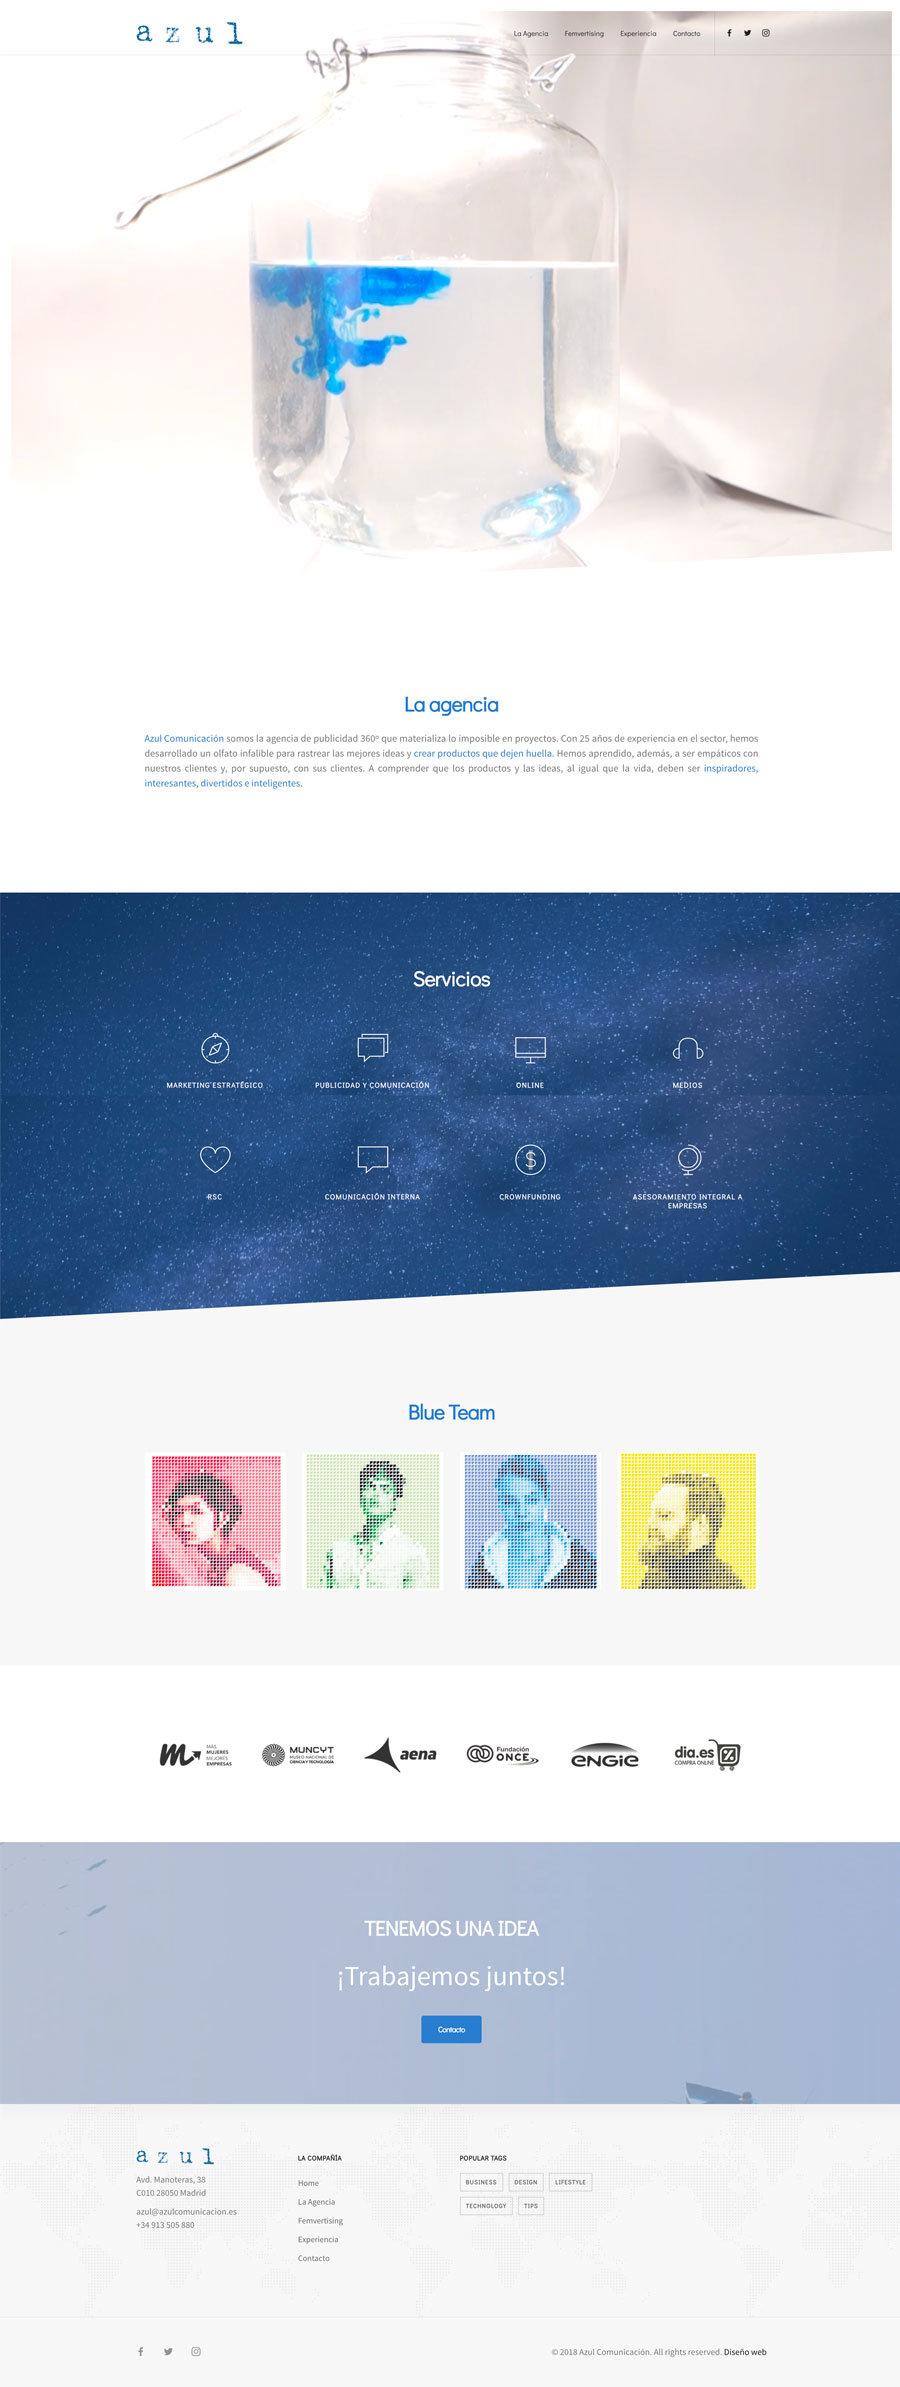 proyectos-wellaggio-pagina-web-azul-comunicacion